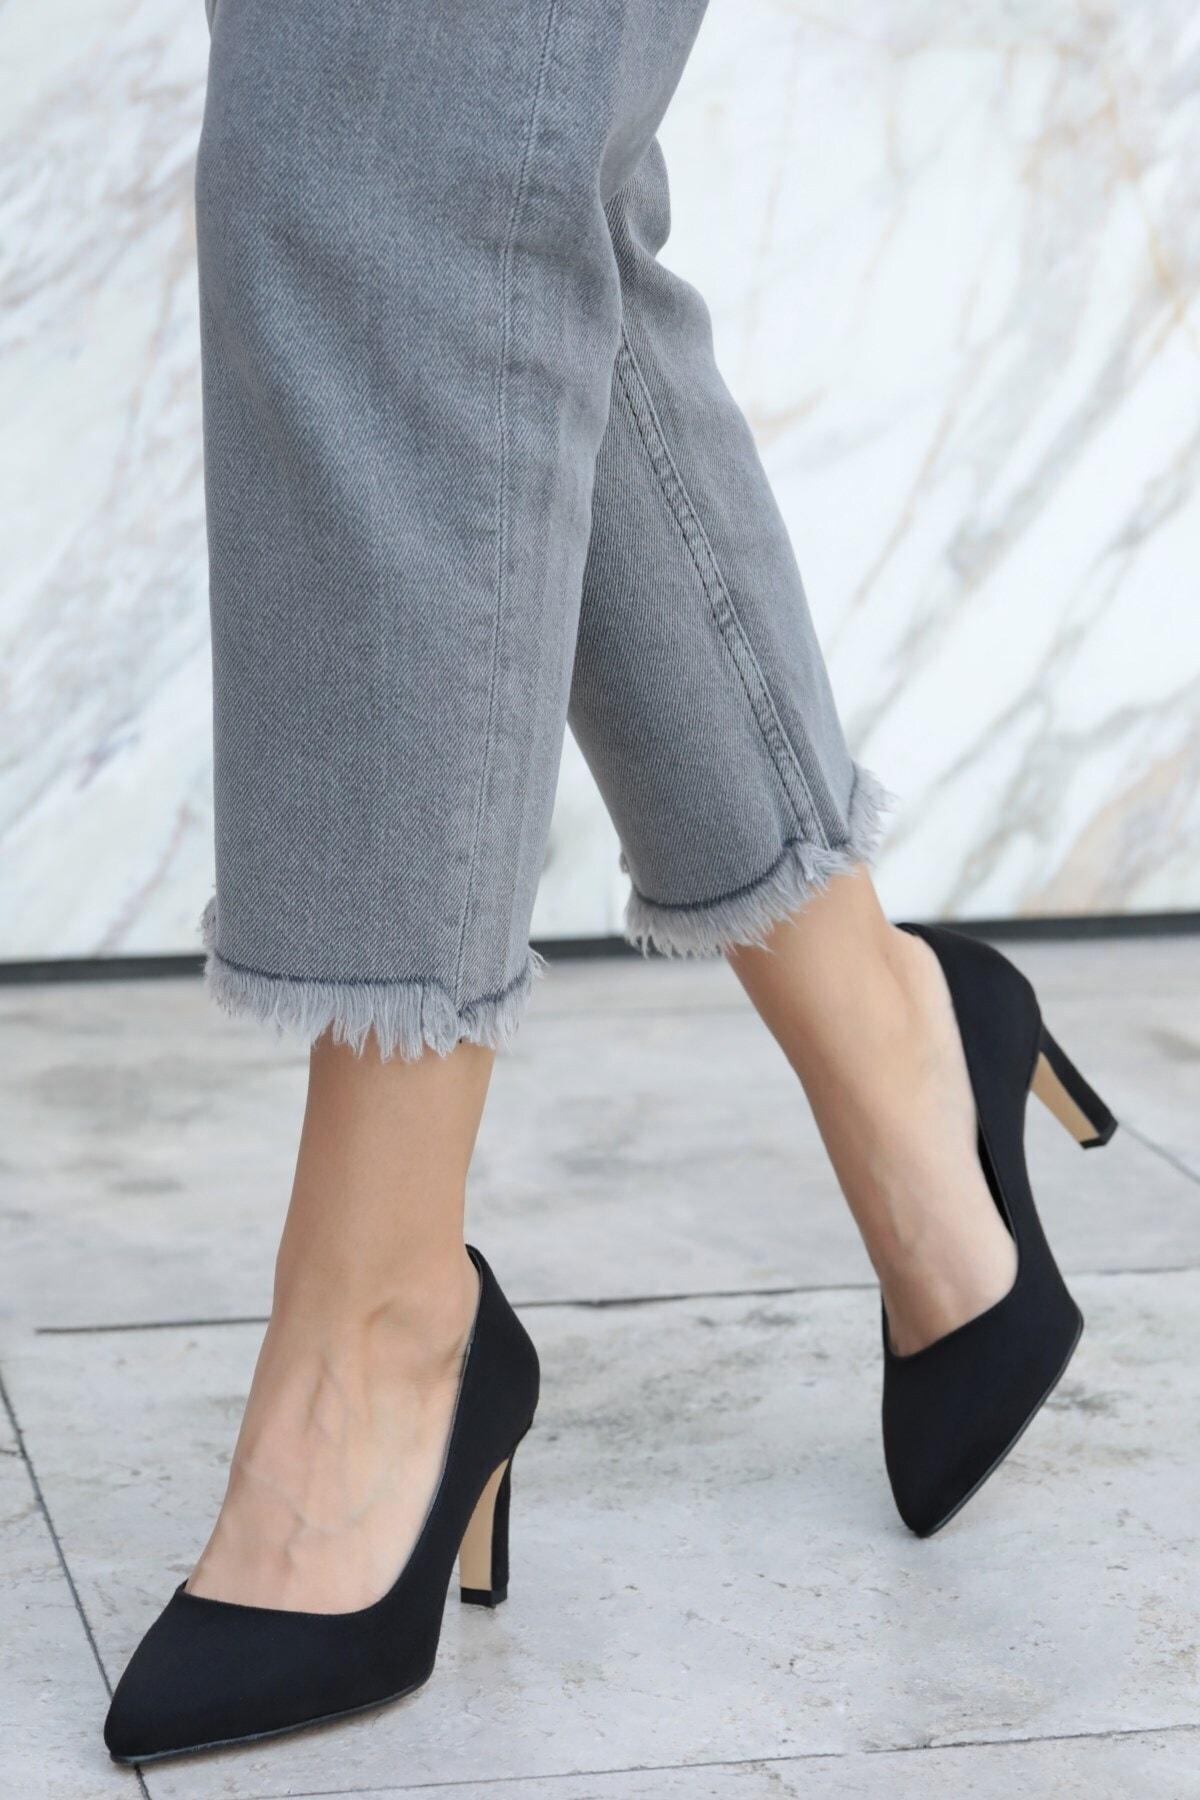 Mio Gusto Lita Siyah Süet Topuklu Ayakkabı 1